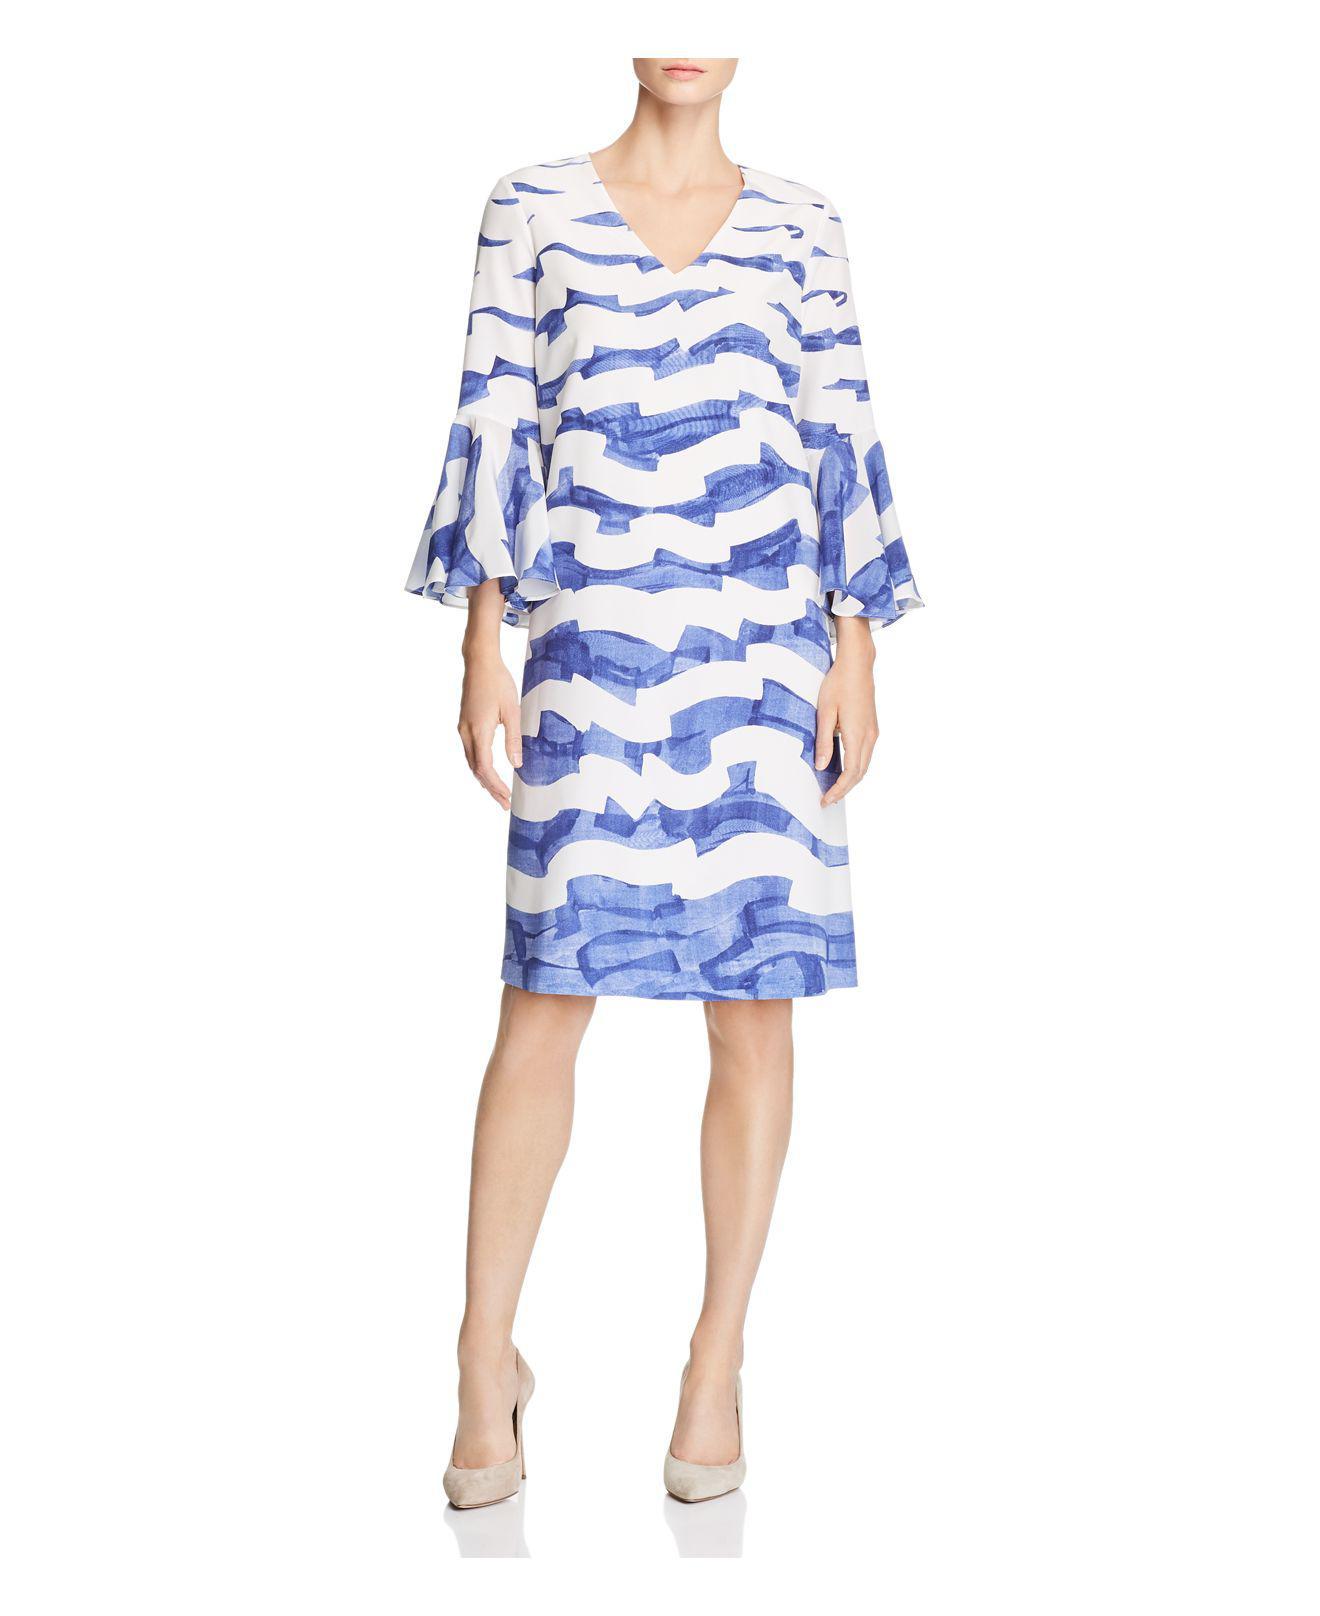 Lafayette 148 New York. Women's Blue Holly Wave-print Silk Dress